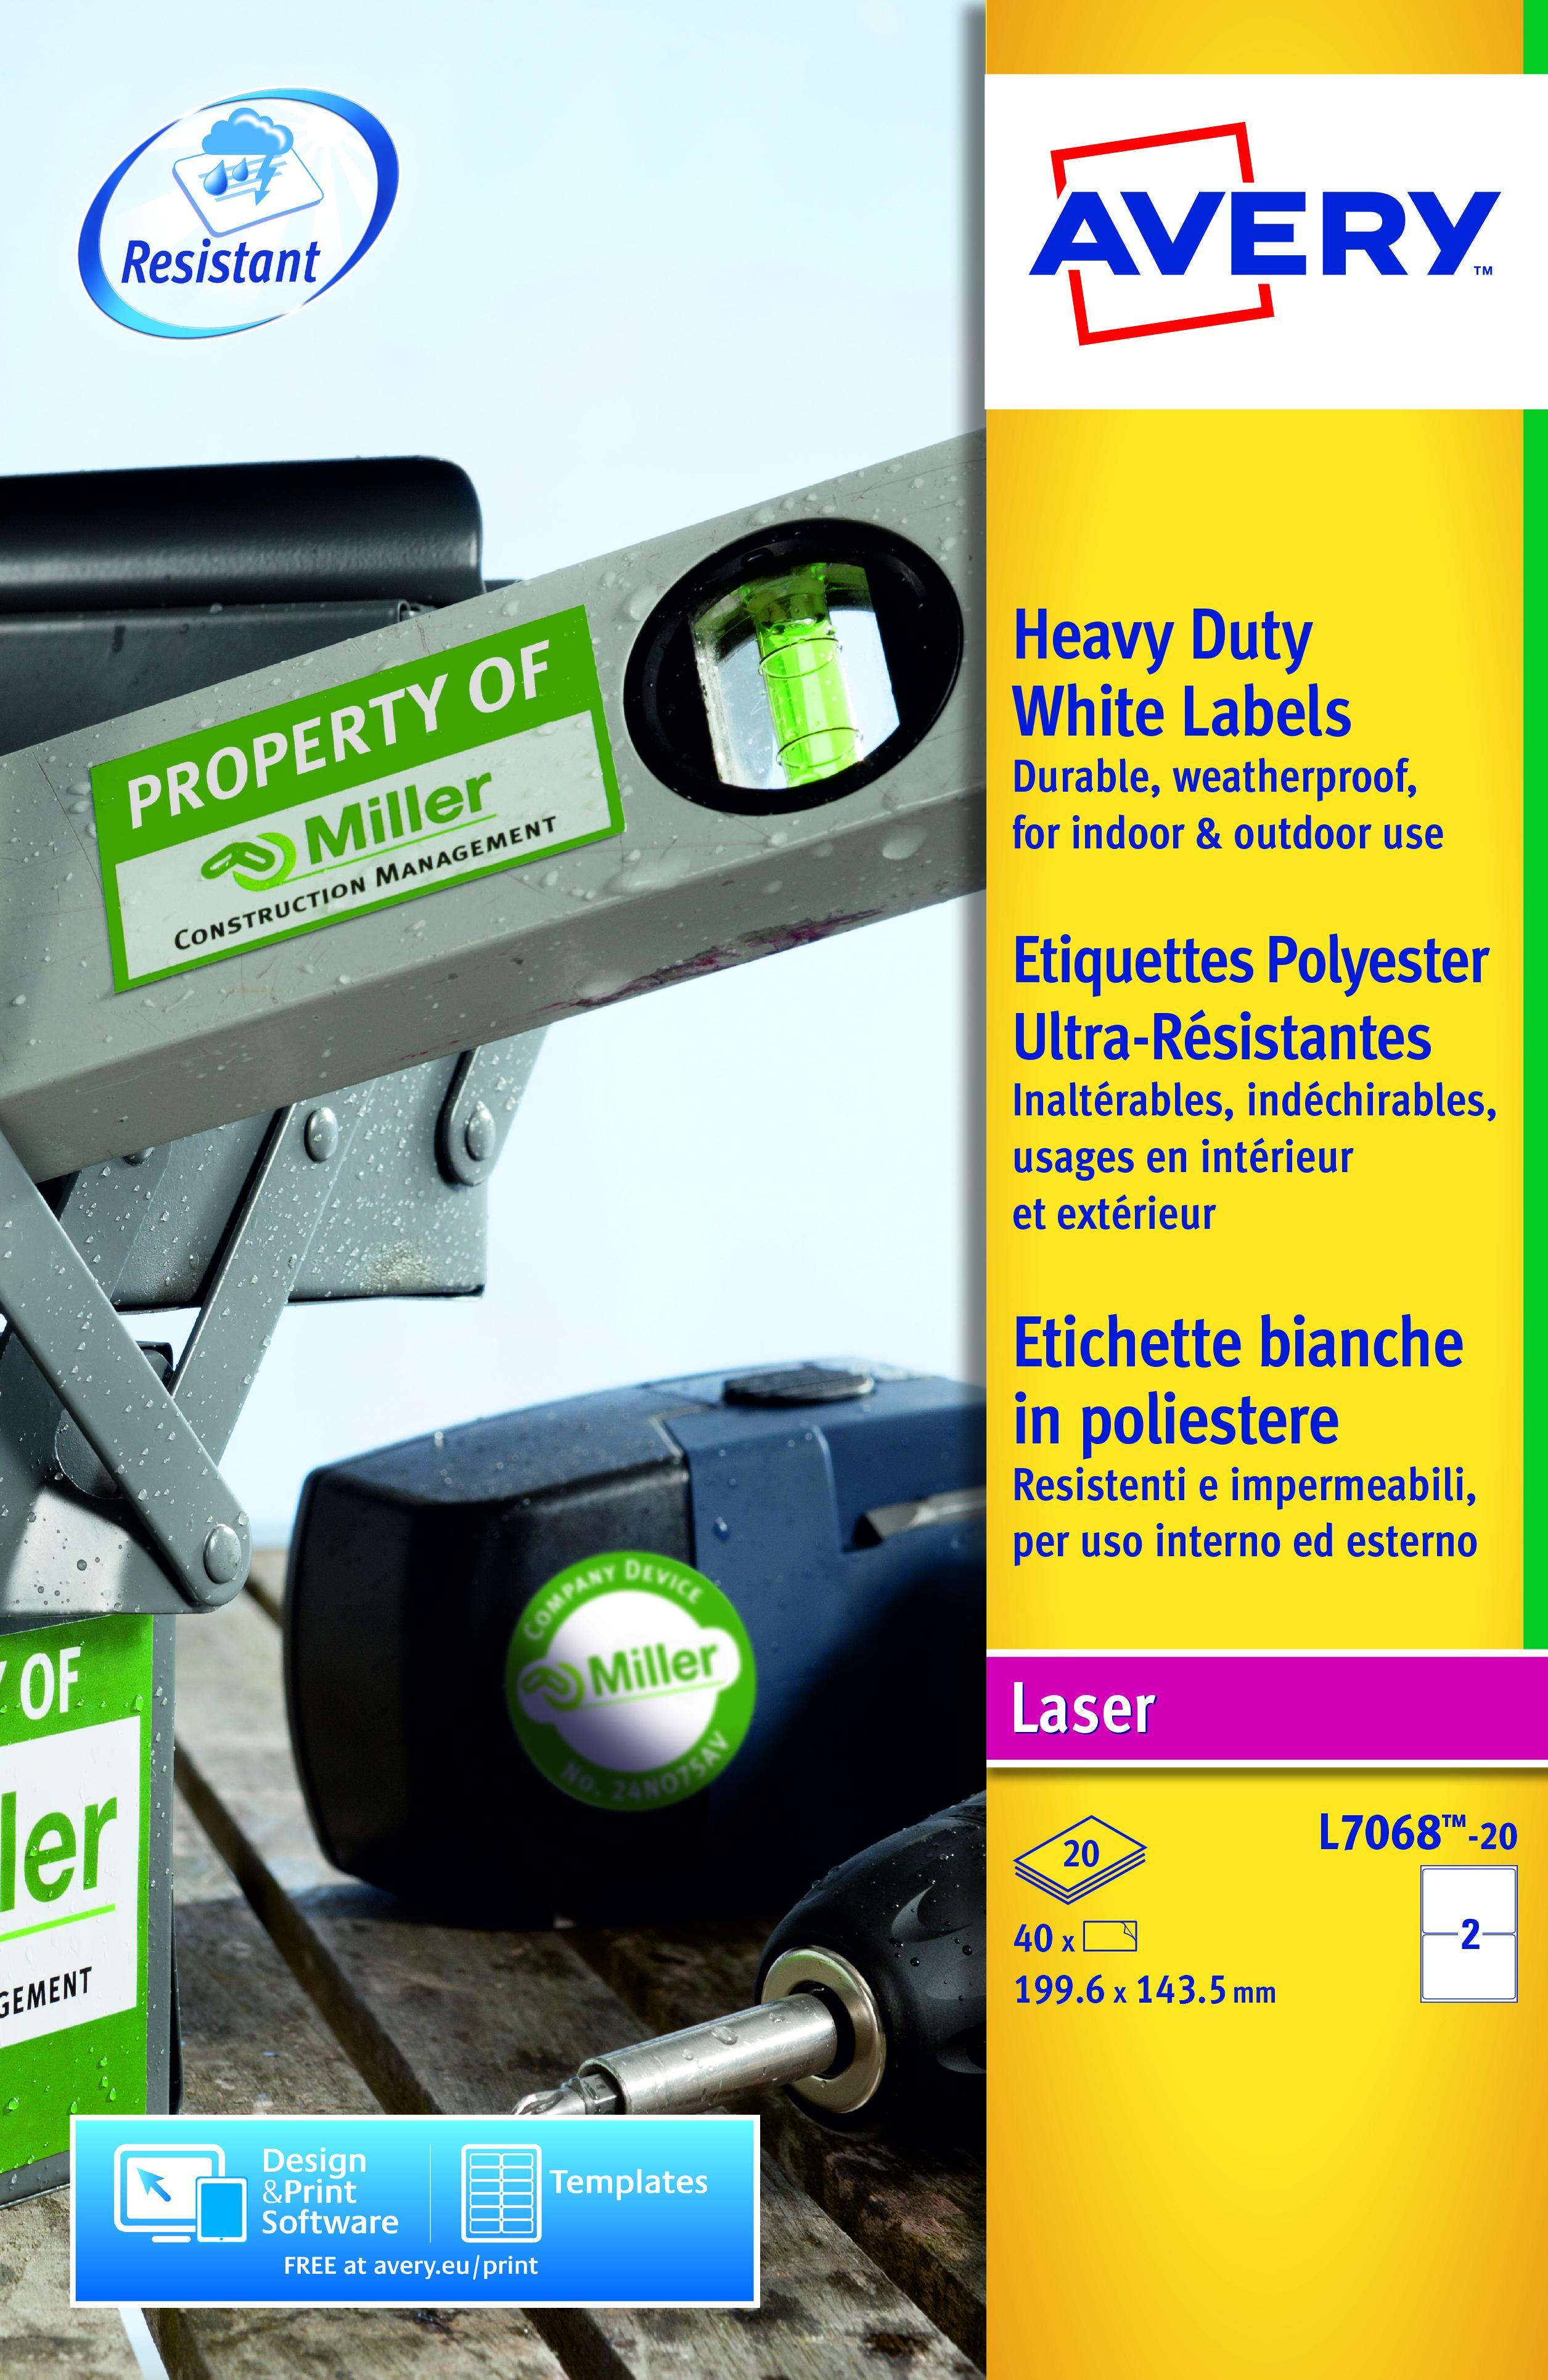 Avery HD Label 200x143.5mm PK400